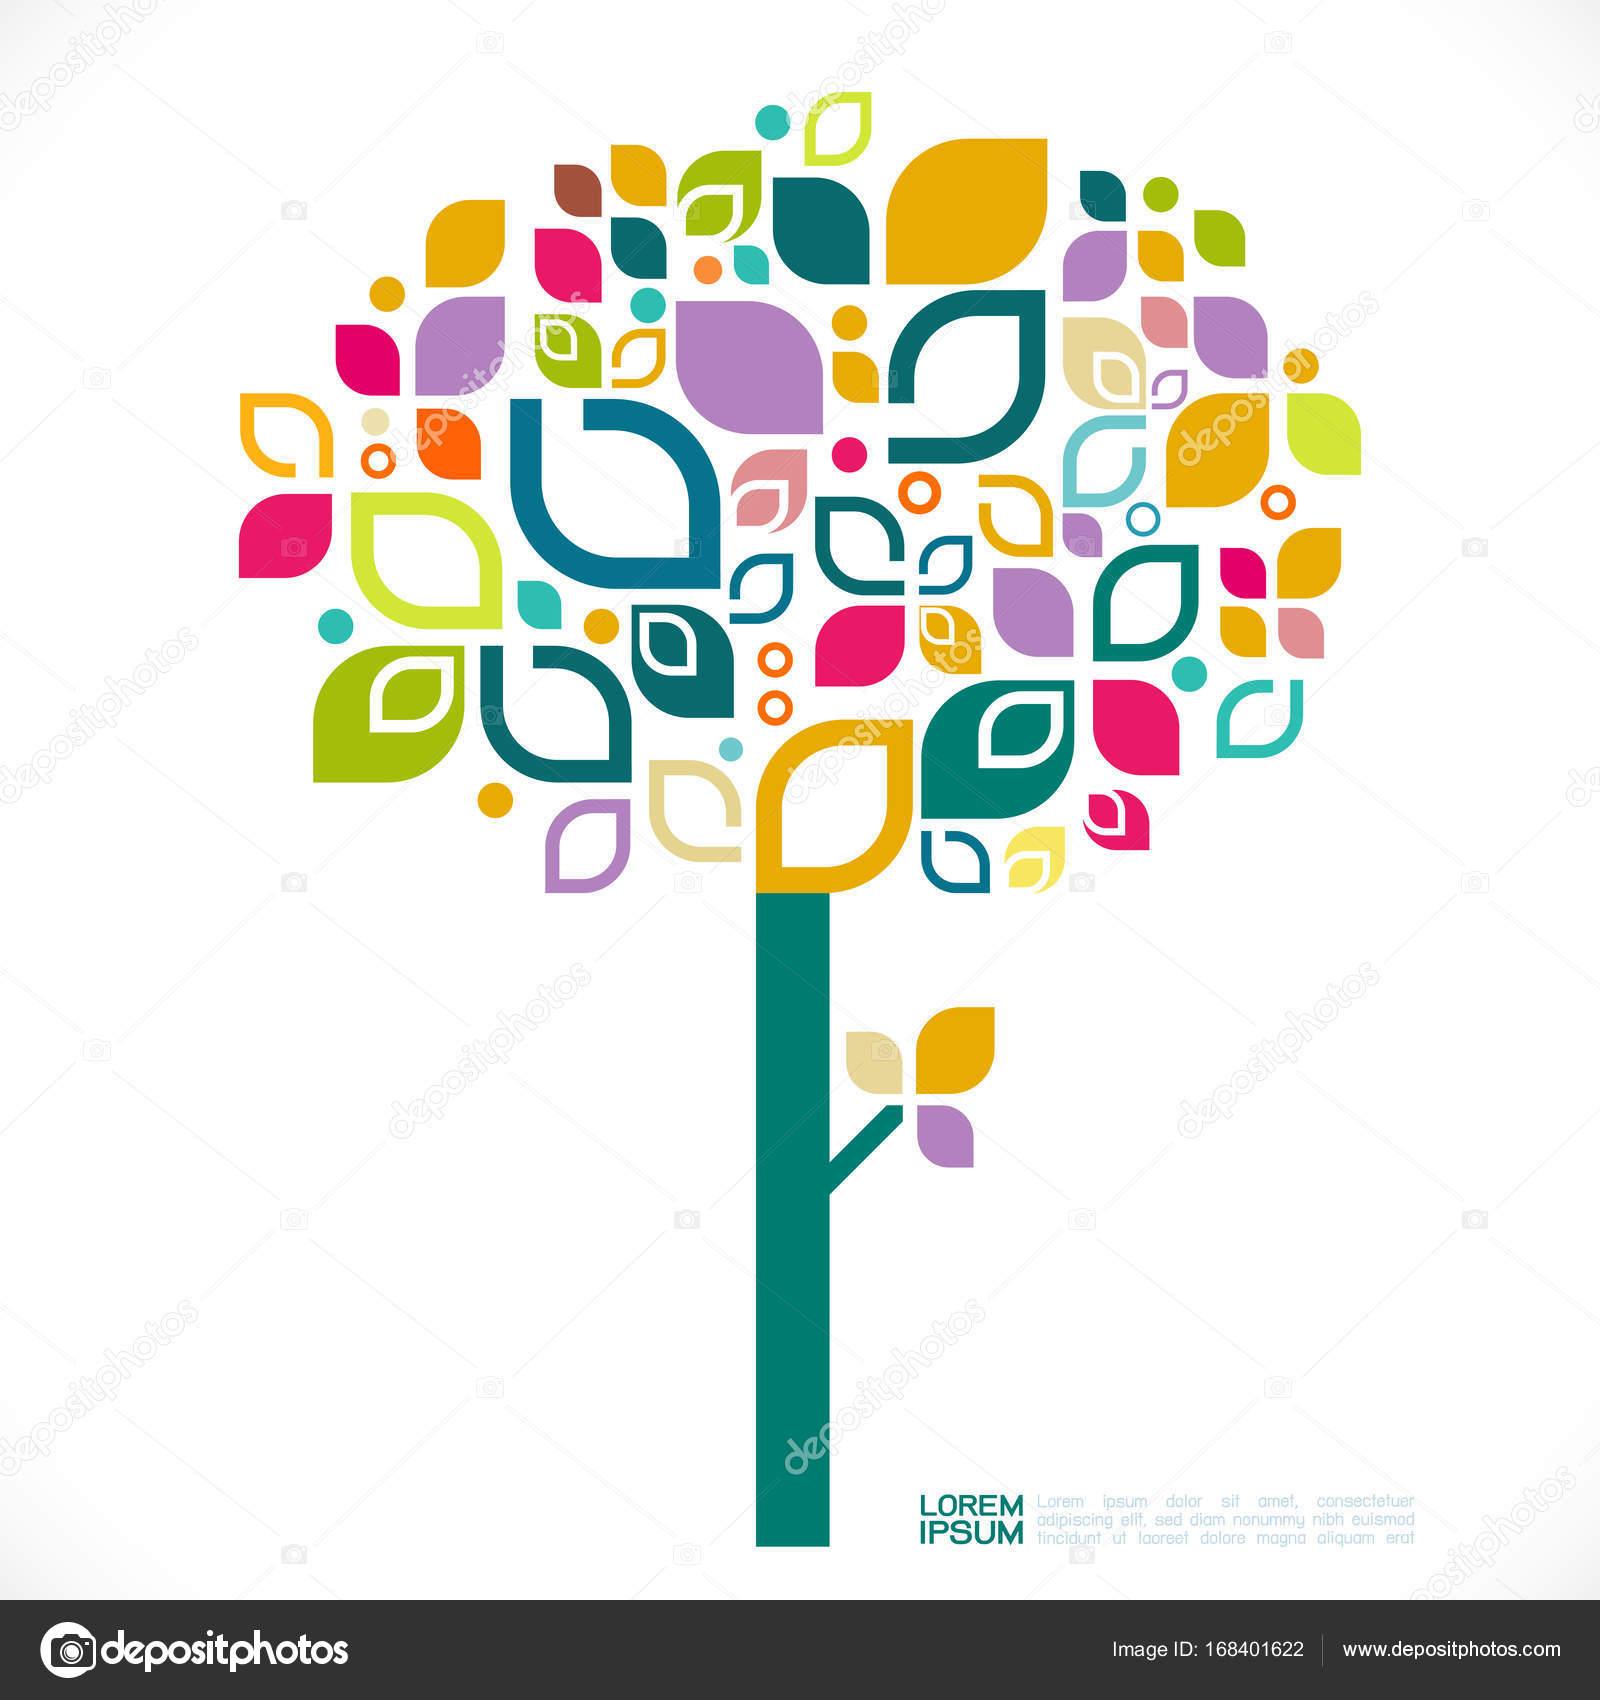 4f2fd7dcd63 ΜΕΓΑΛΩΝ ΕΠΙΧΕΙΡΗΣΕΩΝ ταυτότητα σχεδιασμού, ηλεκτρονική παρουσίαση  ιστοσελίδας στοιχείο, εικονογράφηση διάνυσμα — Διάνυσμα με ...